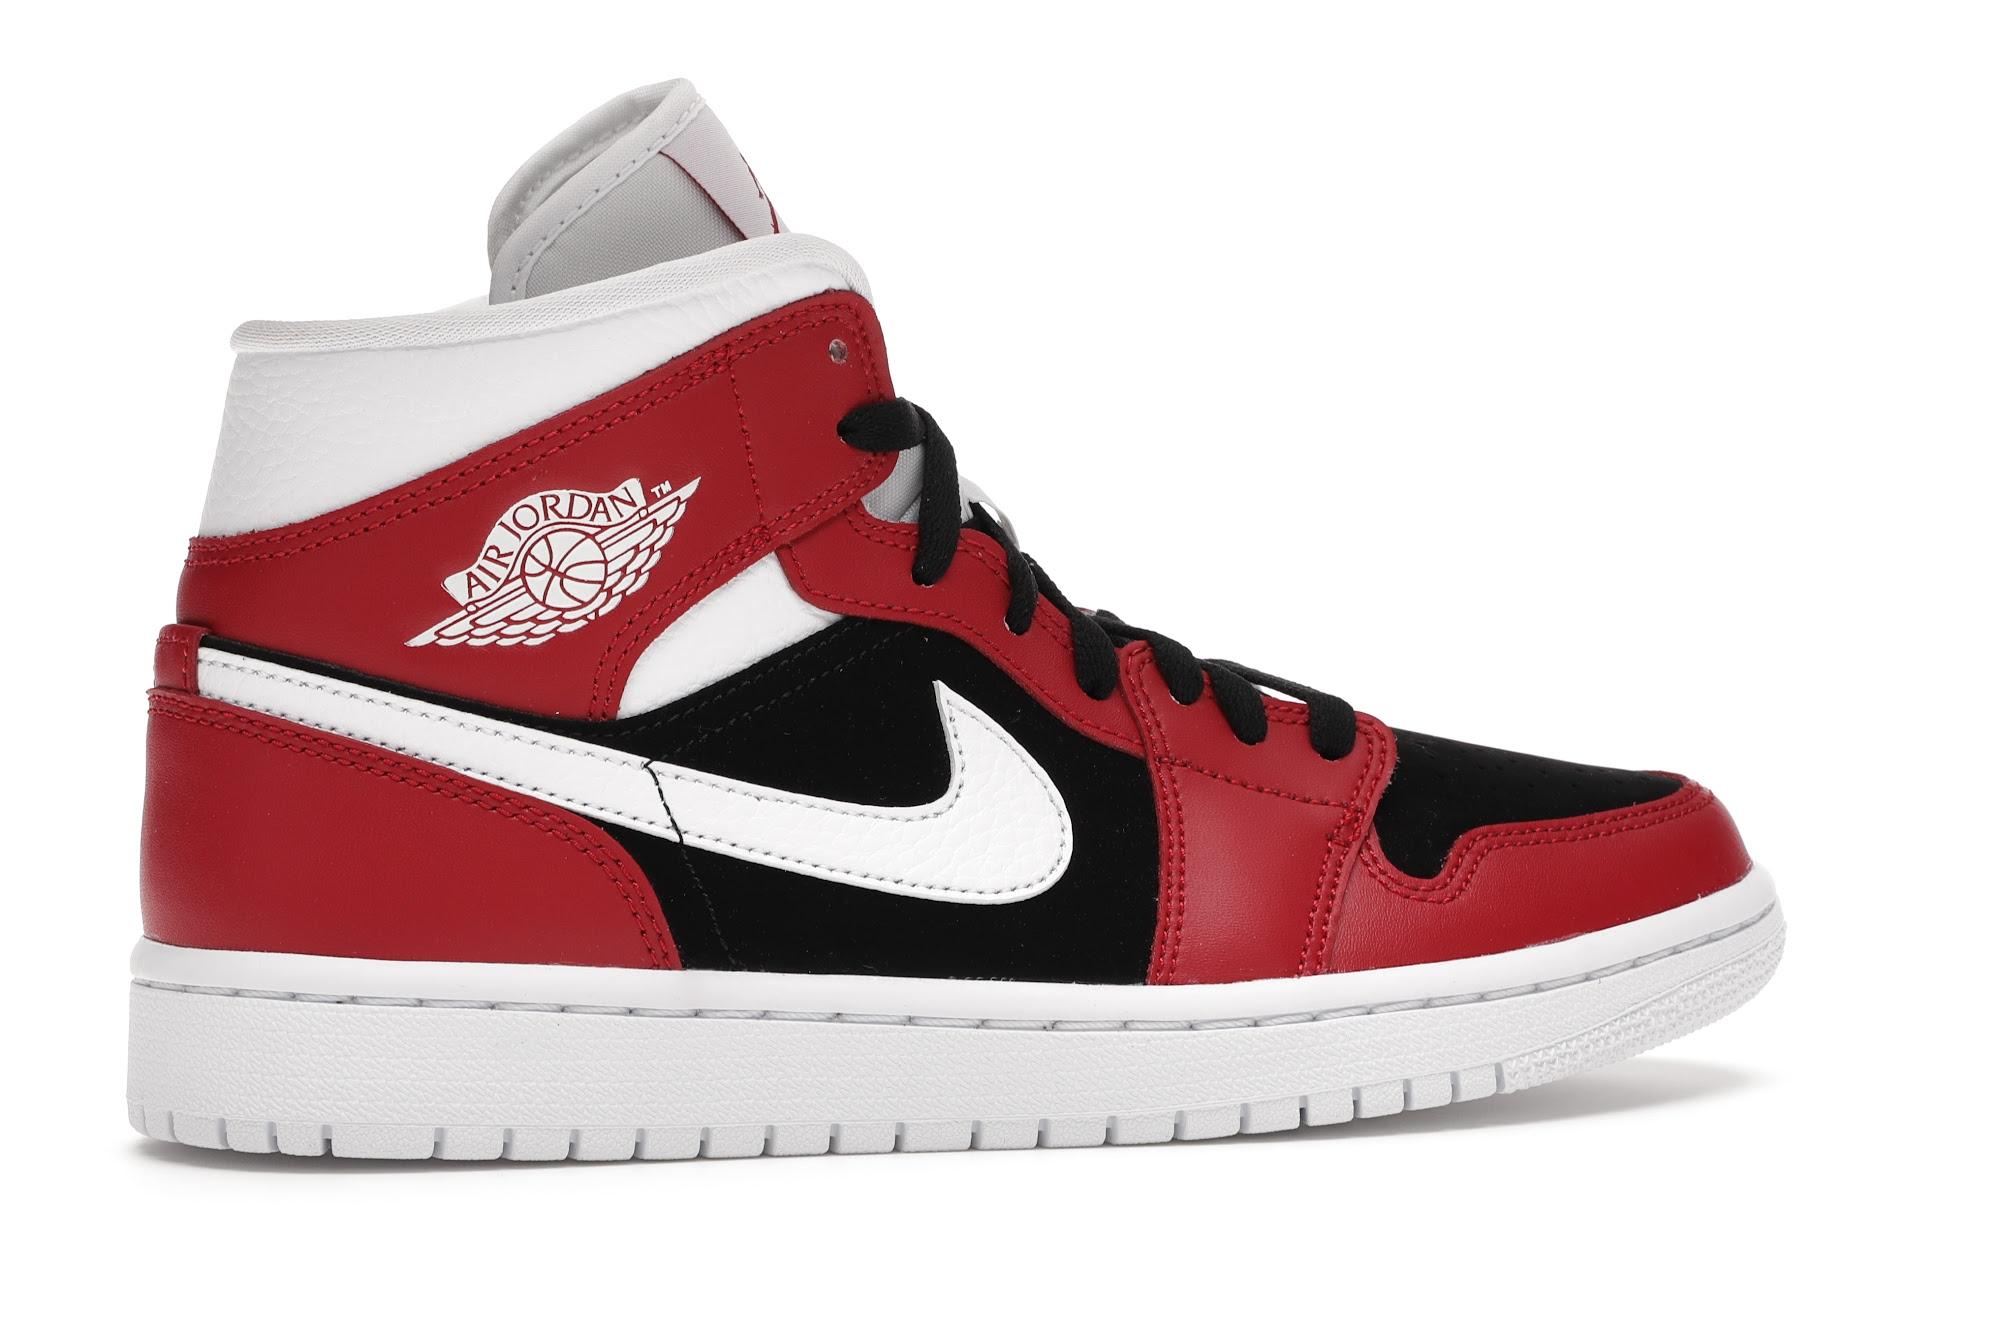 Jordan 1 Mid Gym Red Black (W)